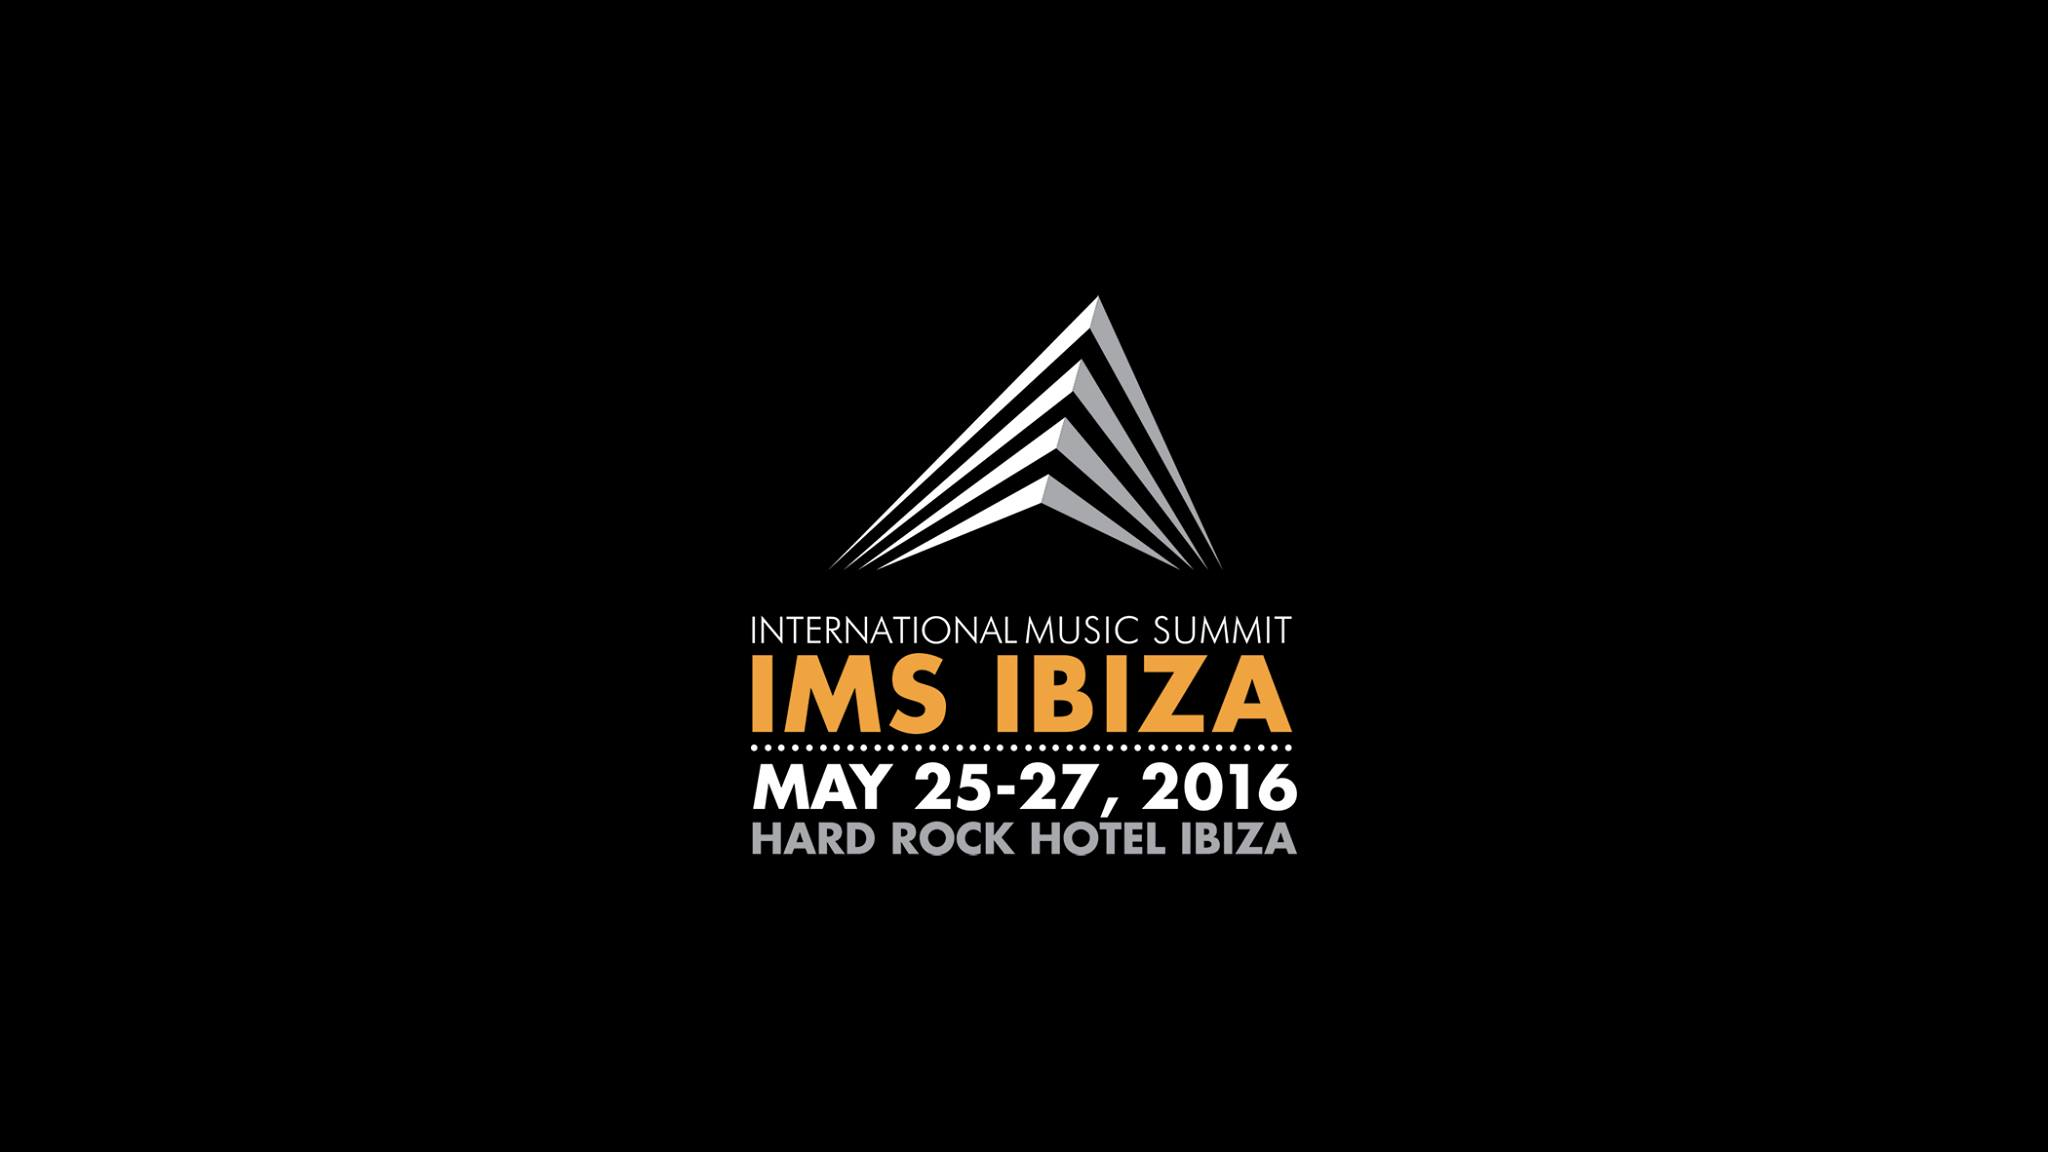 ims-ibiza-2016.jpg